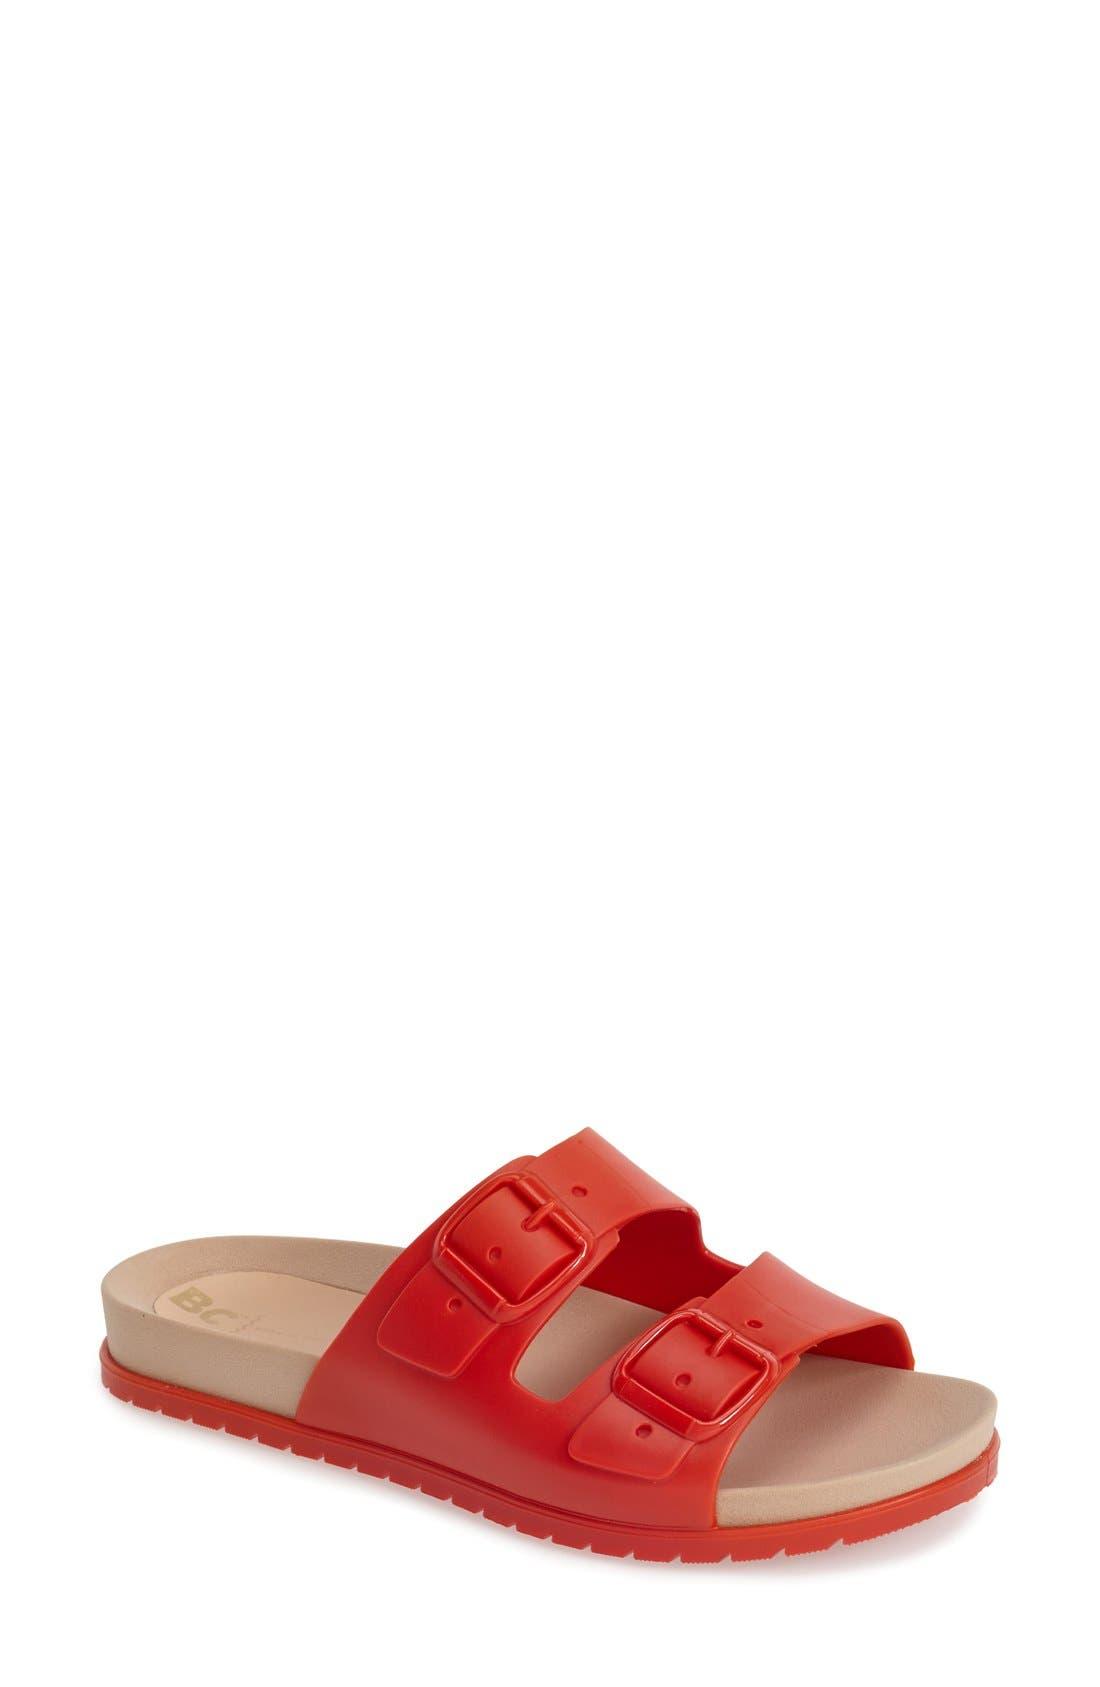 Main Image - BC Footwear 'Dim The Lights' Slide Sandal (Women)